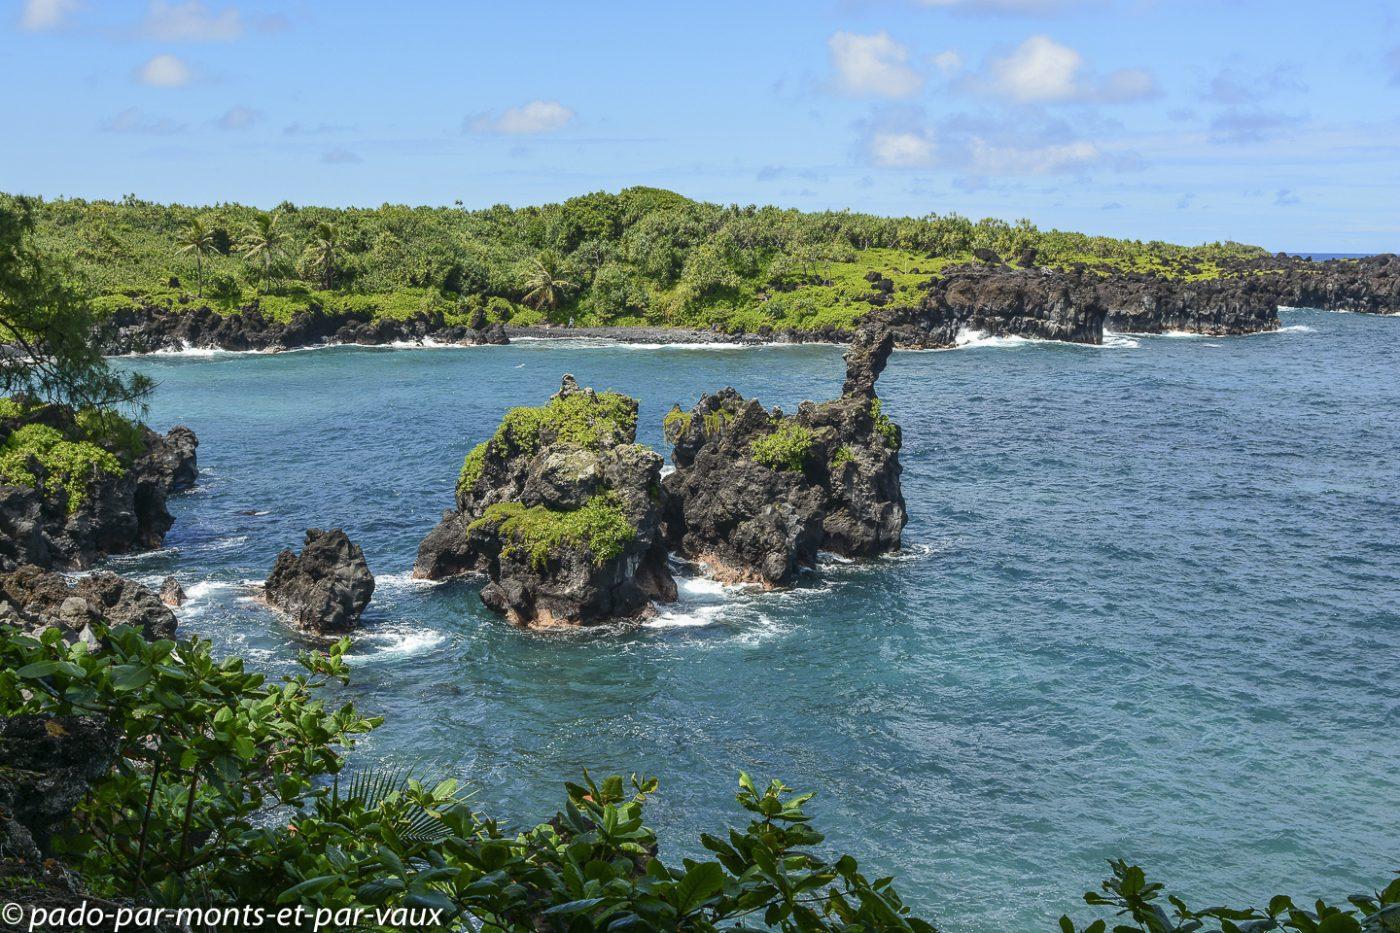 Maui - Route de Hana - Wai'anapanapa